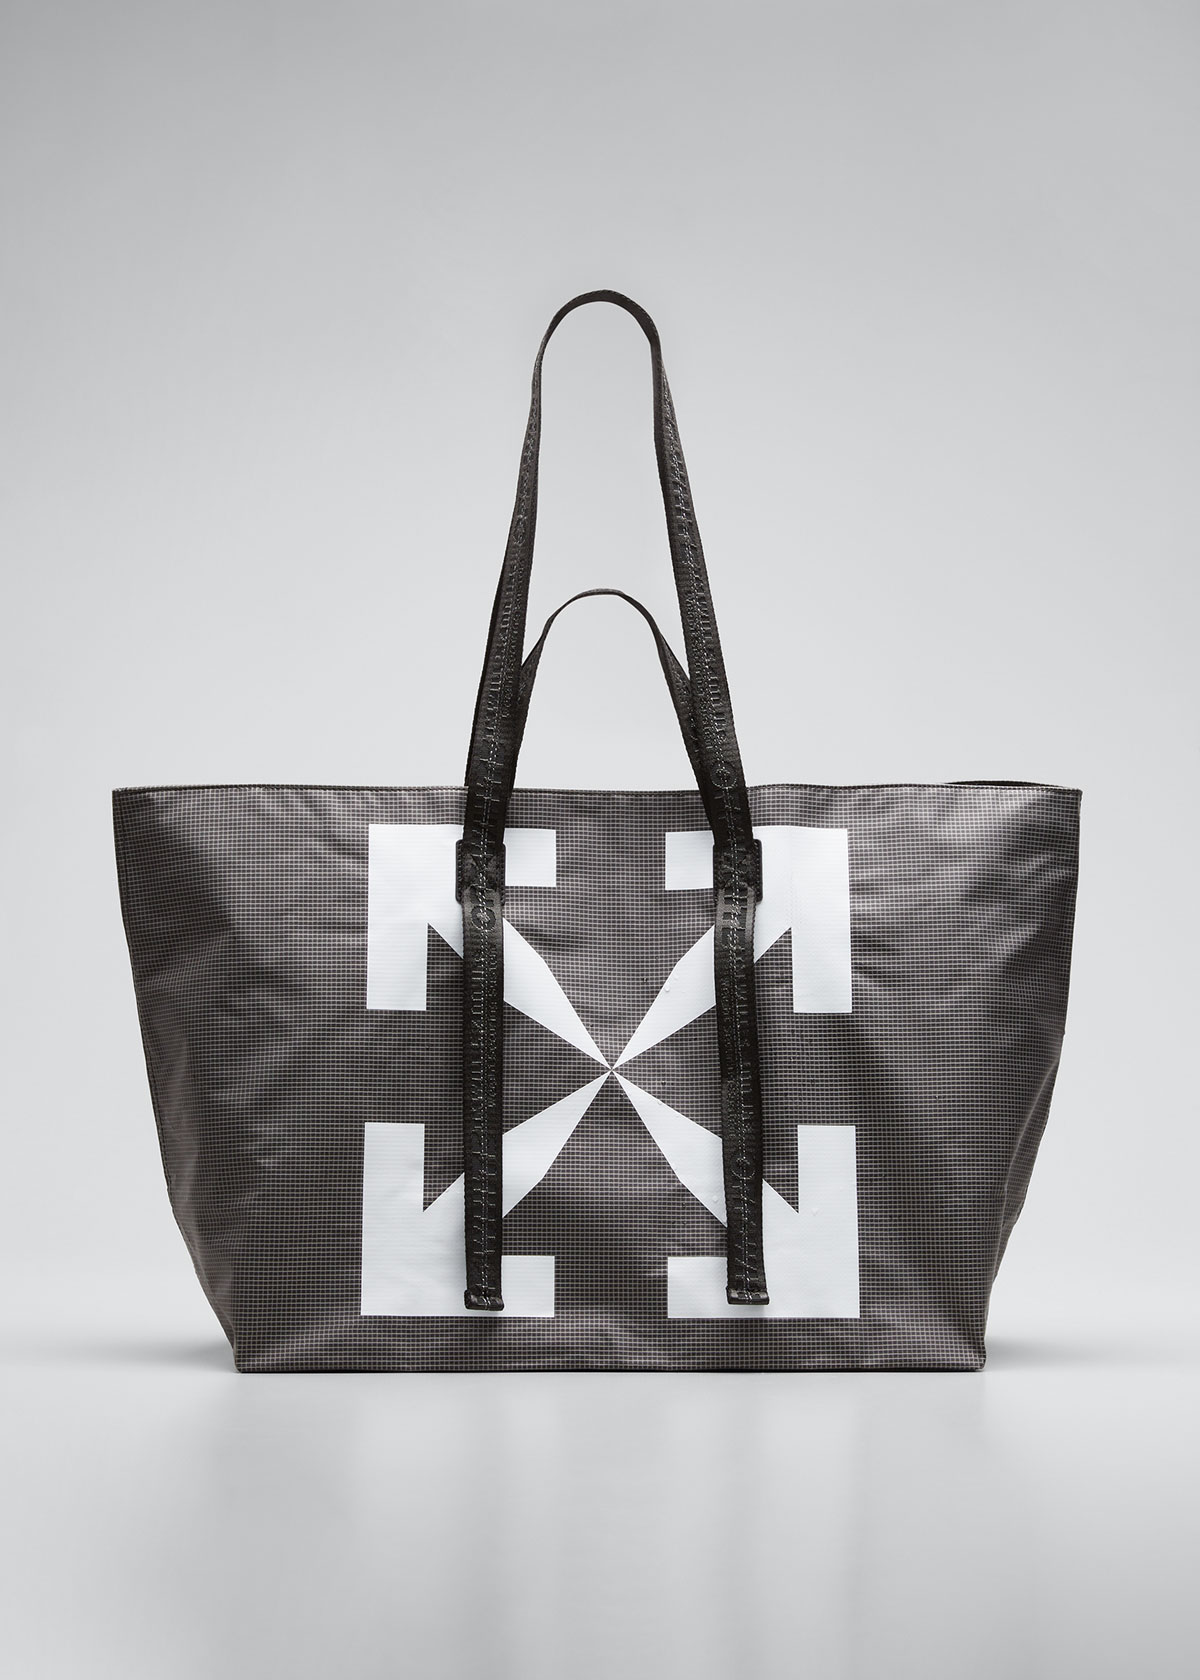 Off-White MEN'S ARROW PVC TOTE BAG